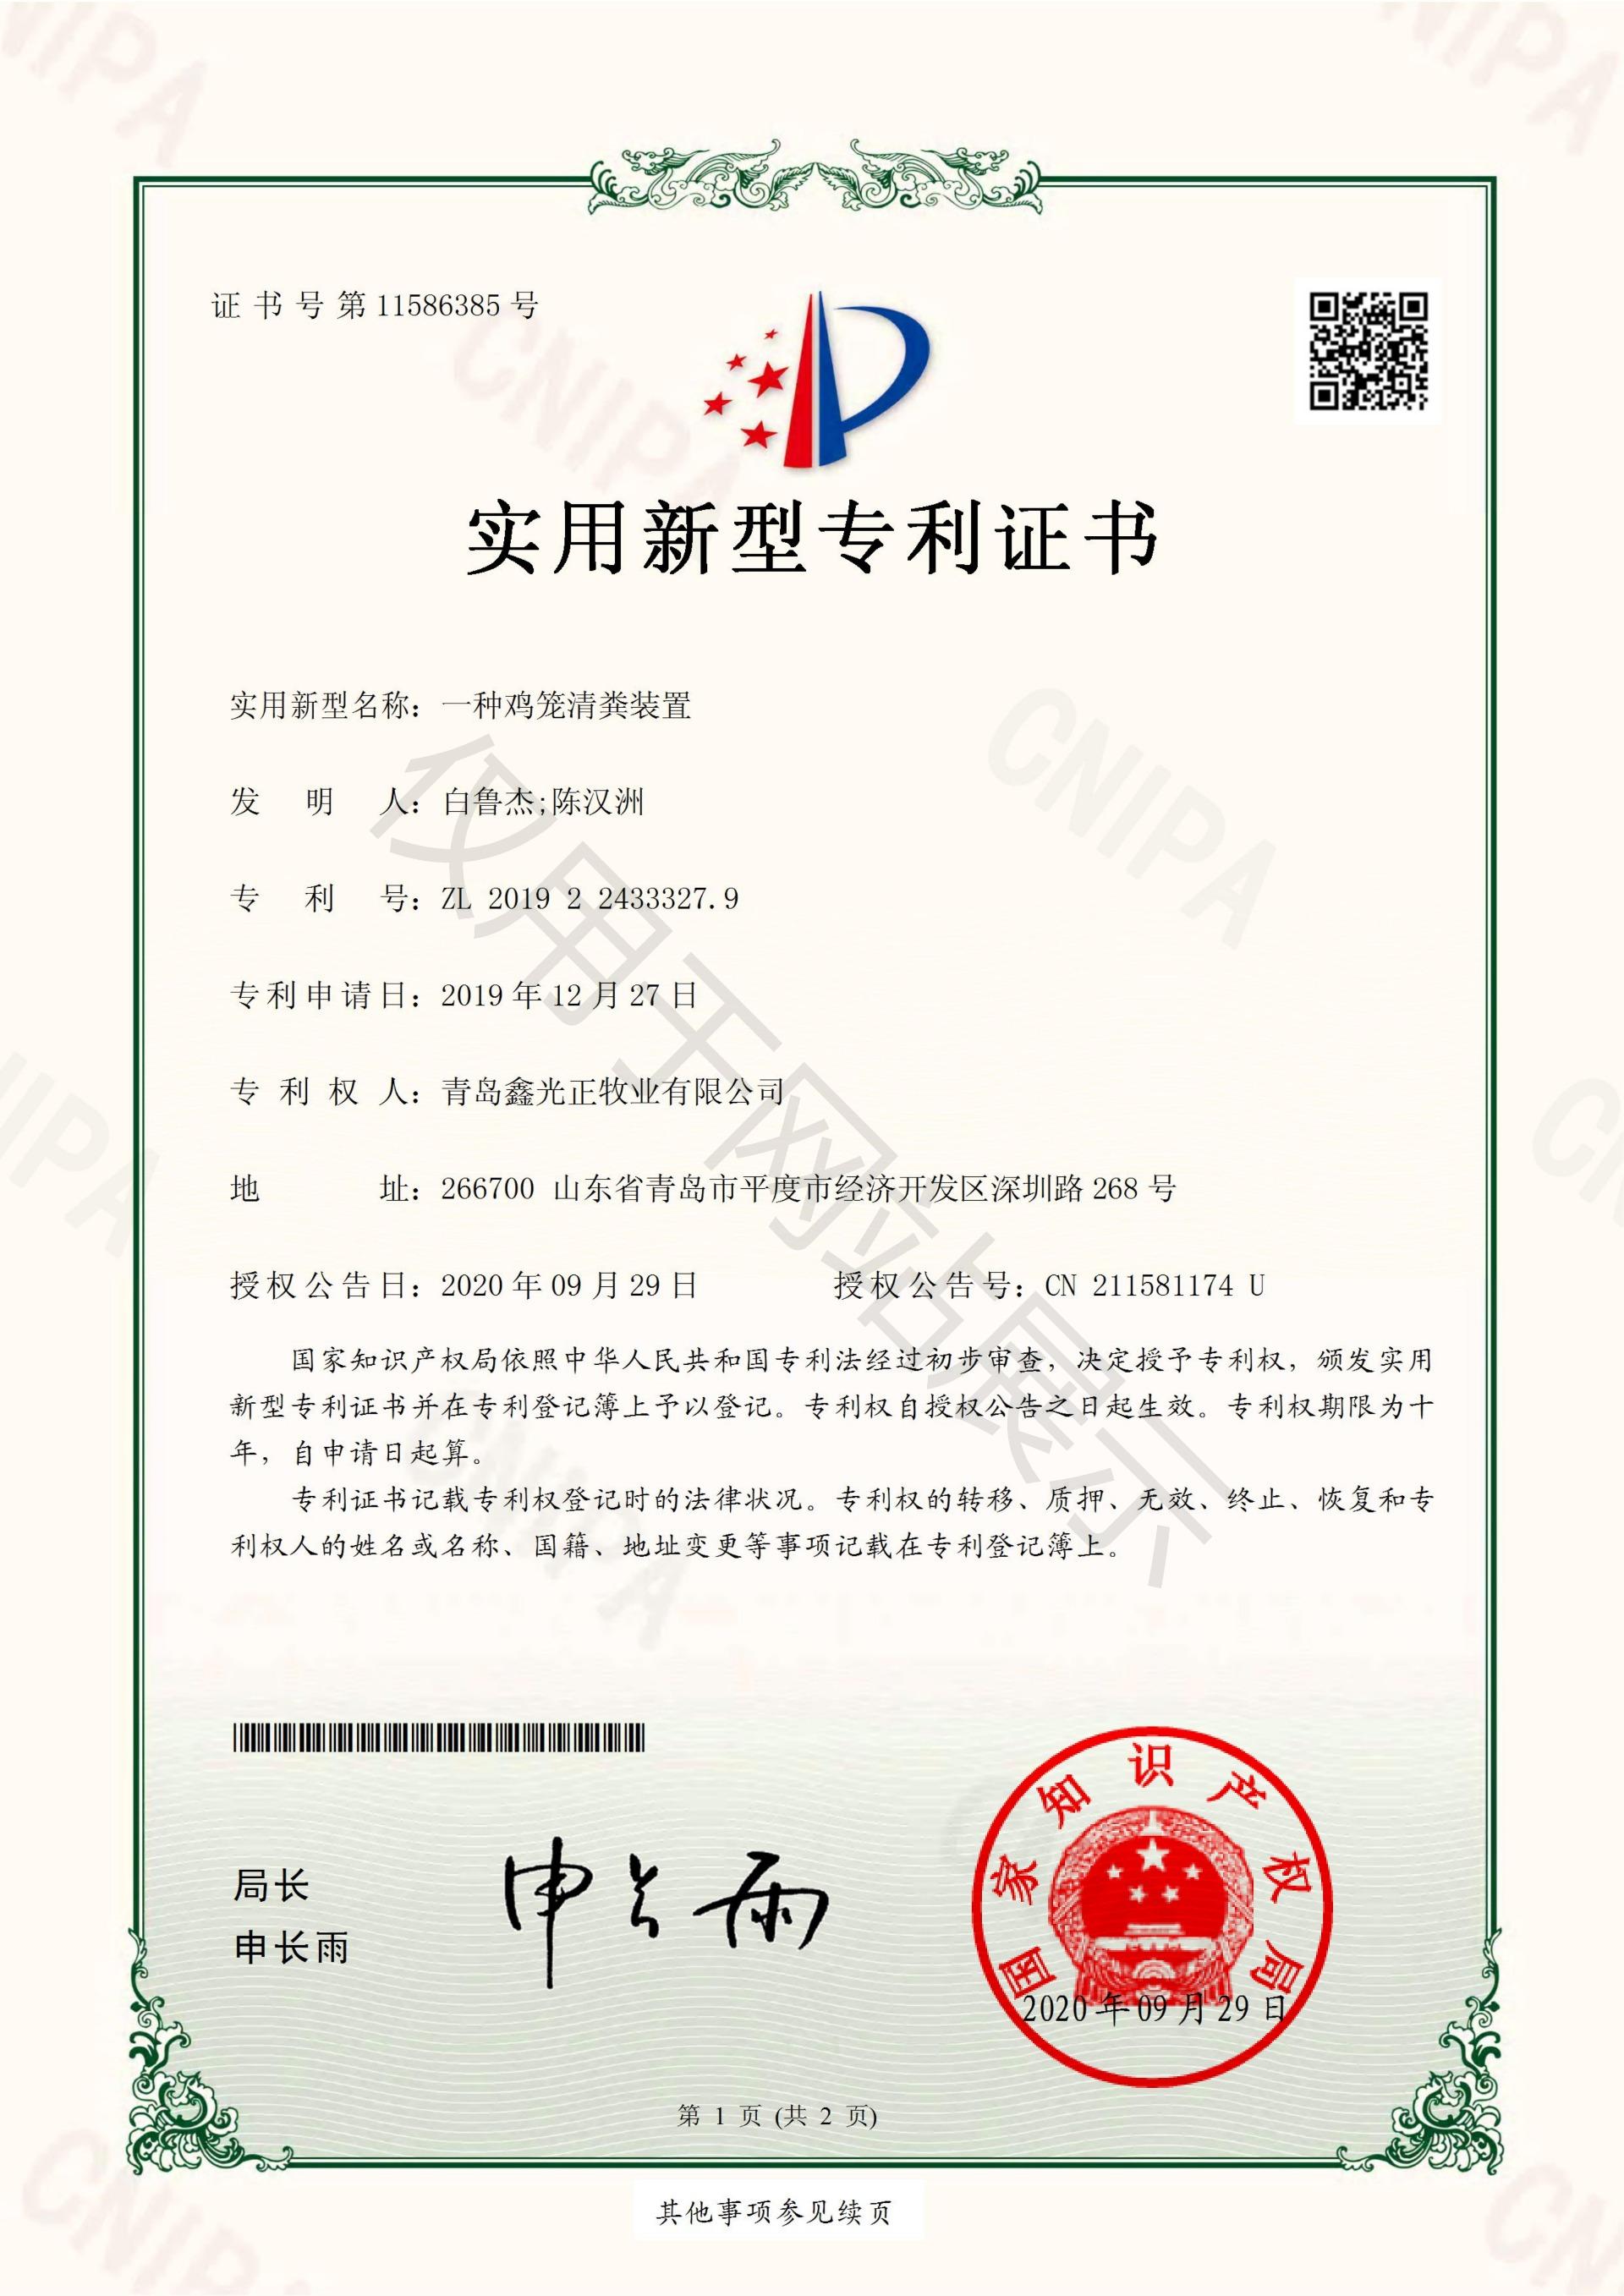 GZD2201912271728-一种鸡笼清粪装置-实用新型专利证书(签章)_00